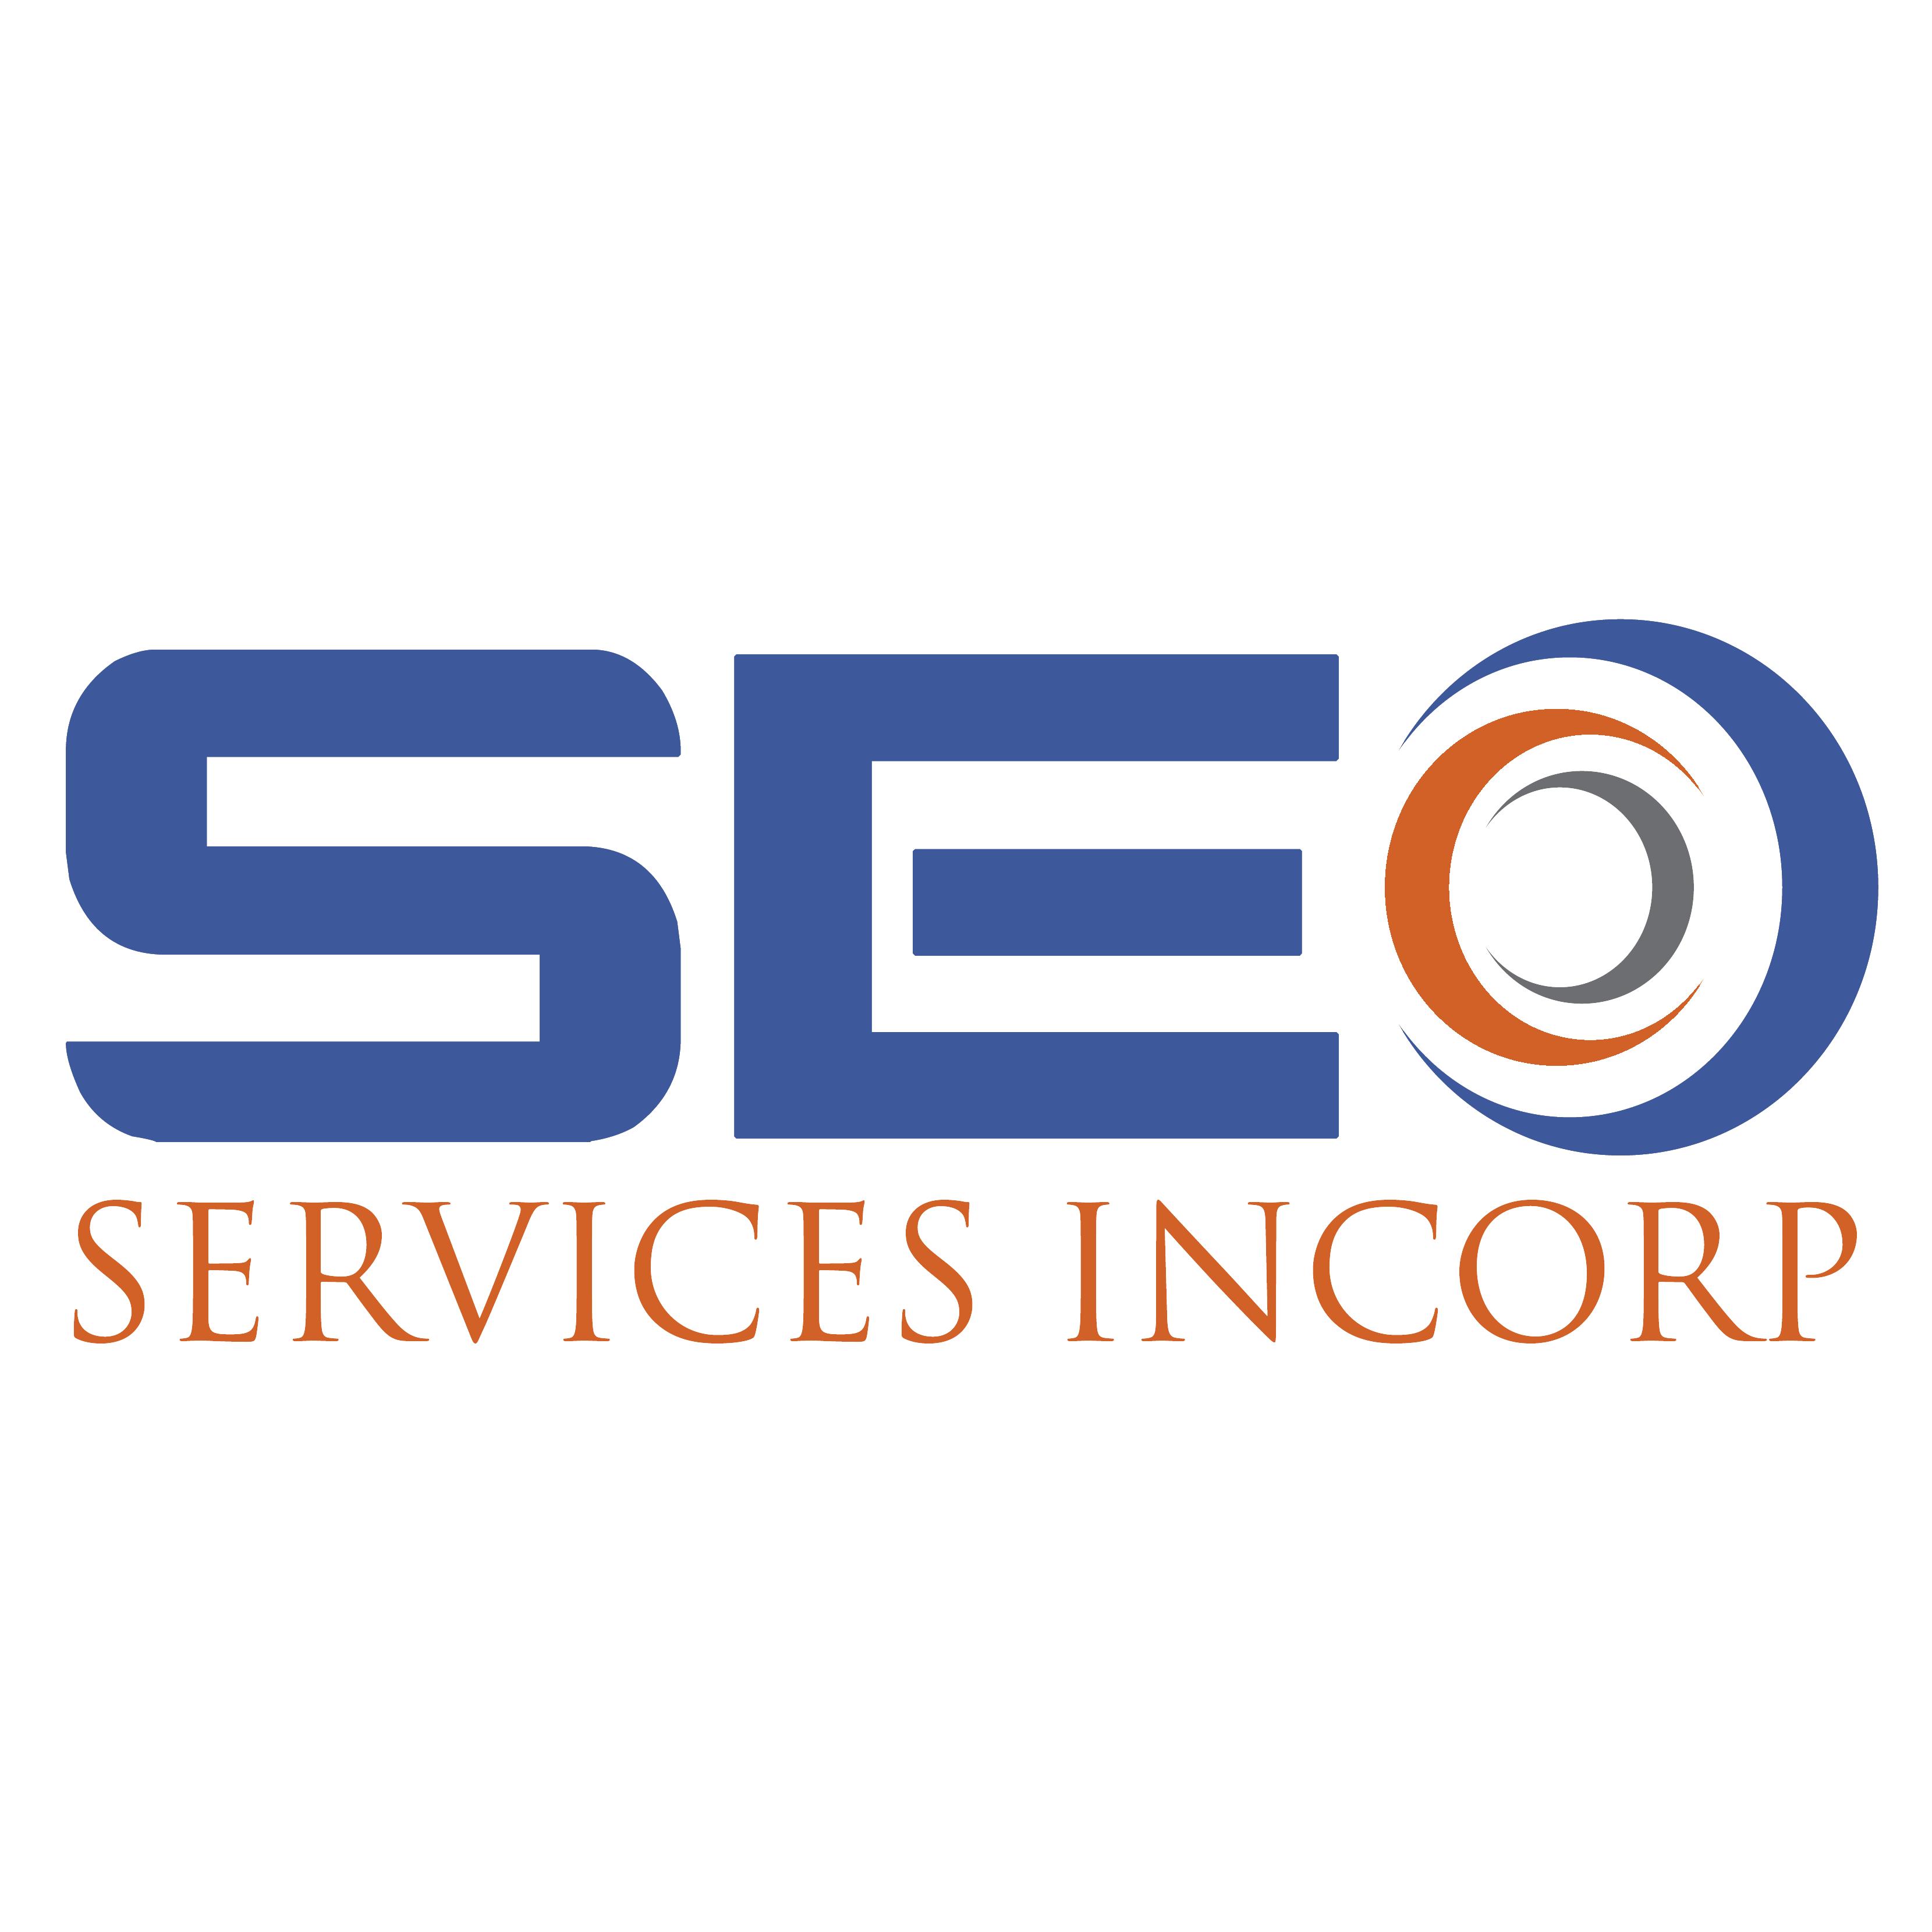 SEO Services Incorp - Portland SEO